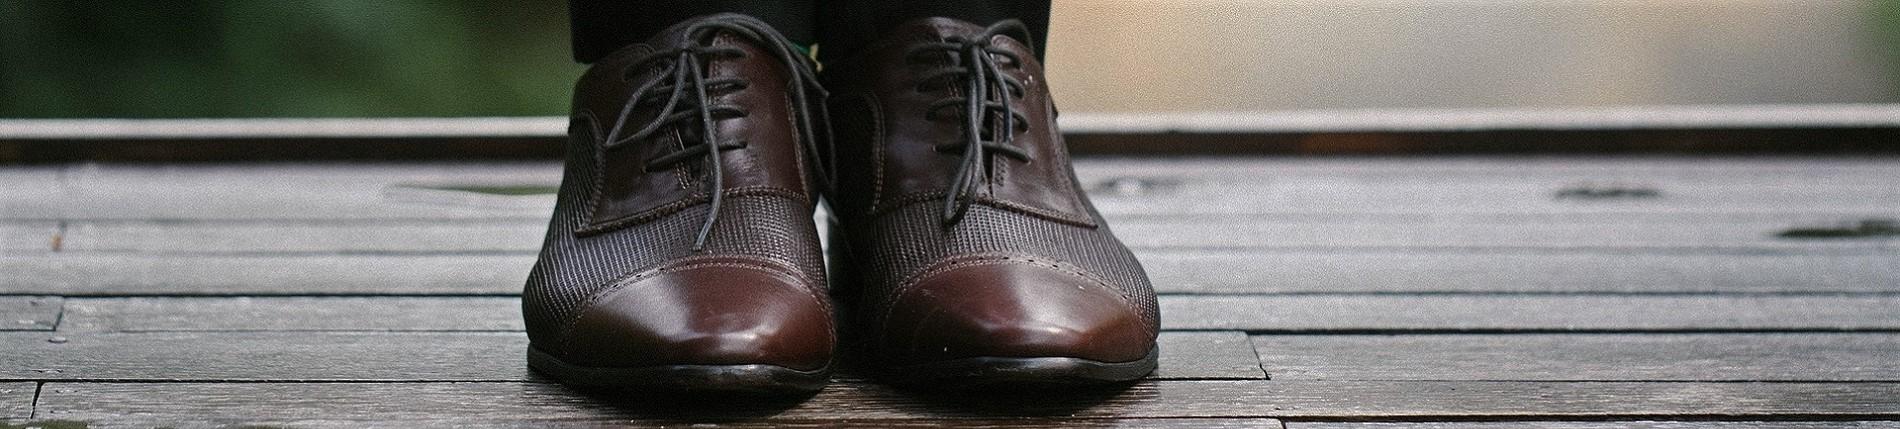 Nette mannenschoenen